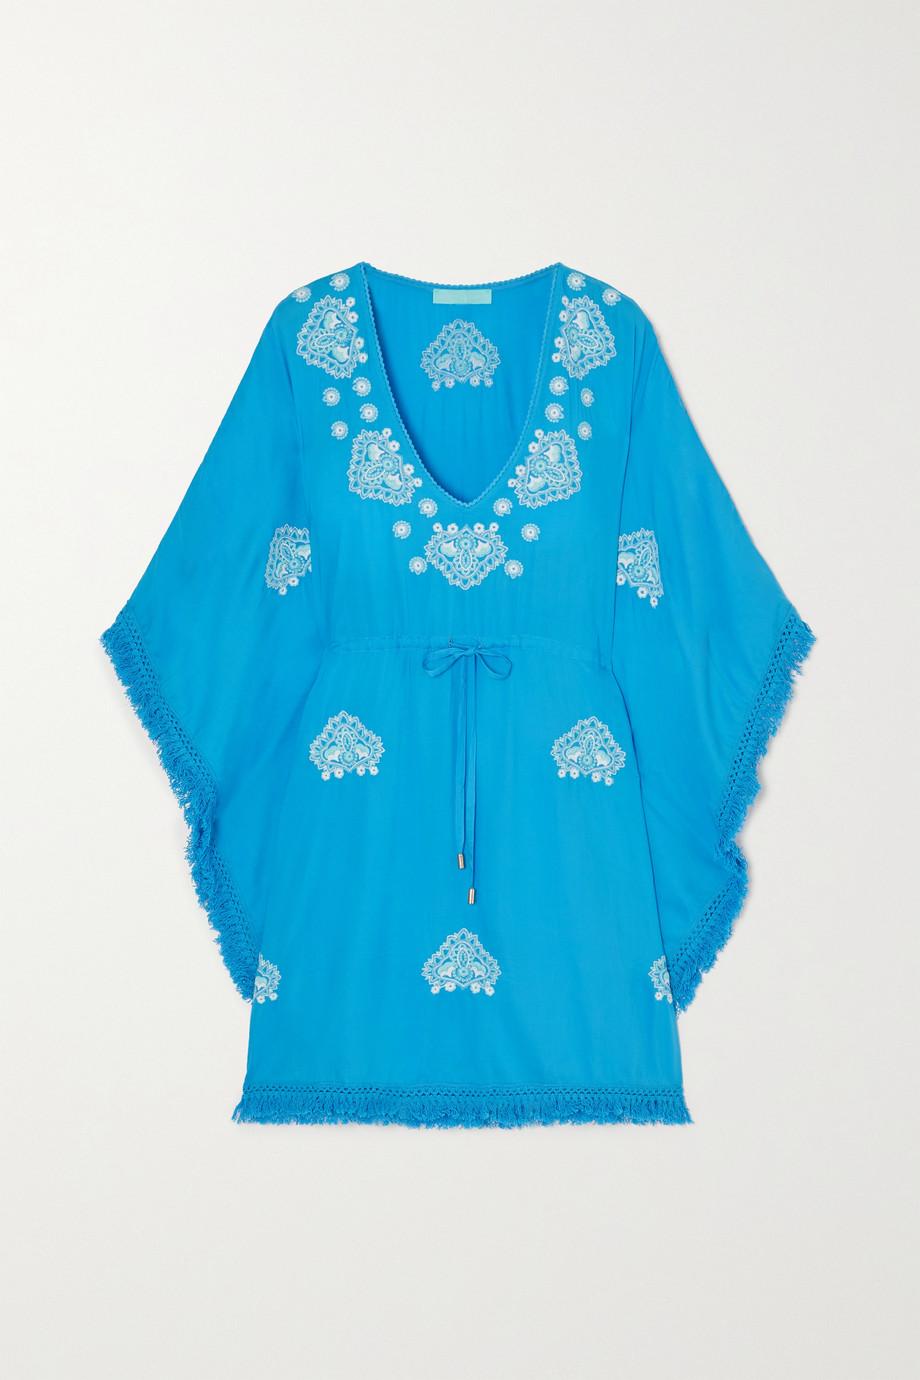 Melissa Odabash Irene 流苏边刺绣巴里纱长罩衫裙